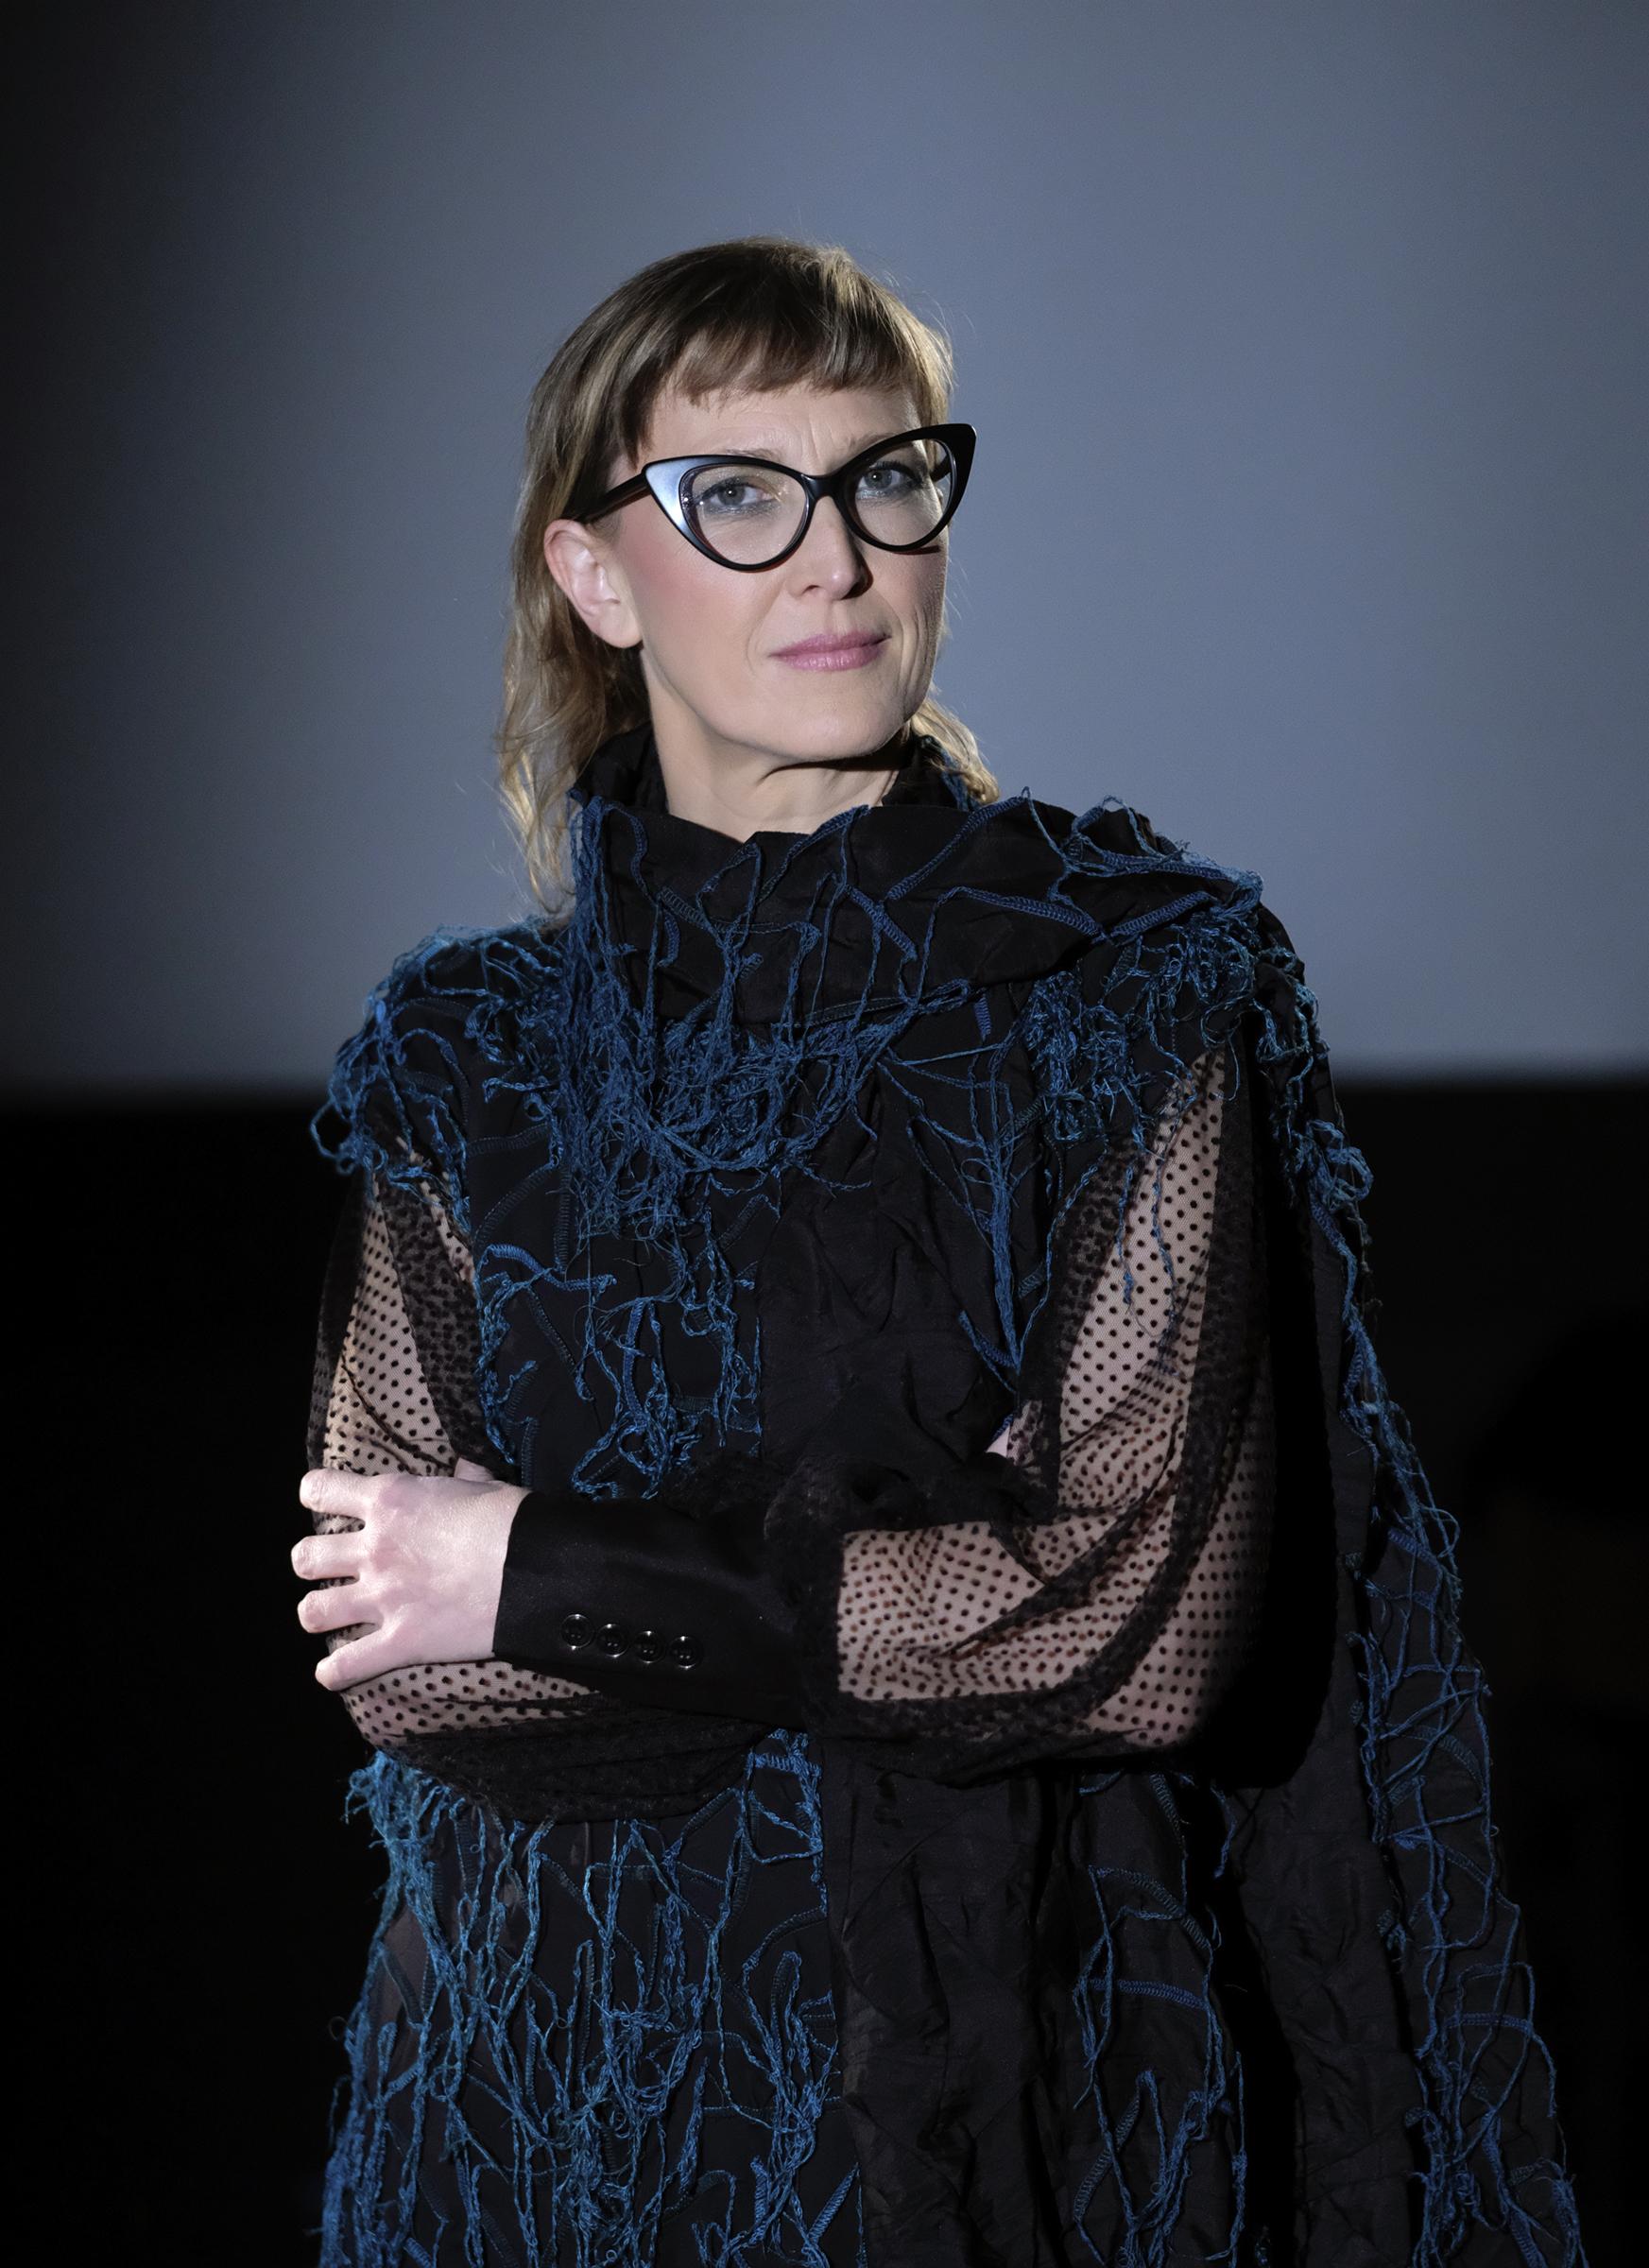 Bosnian filmmaker Jasmila Zbanic poses during an interview in Sarajevo, Bosnia, on Jan. 30, 2021.